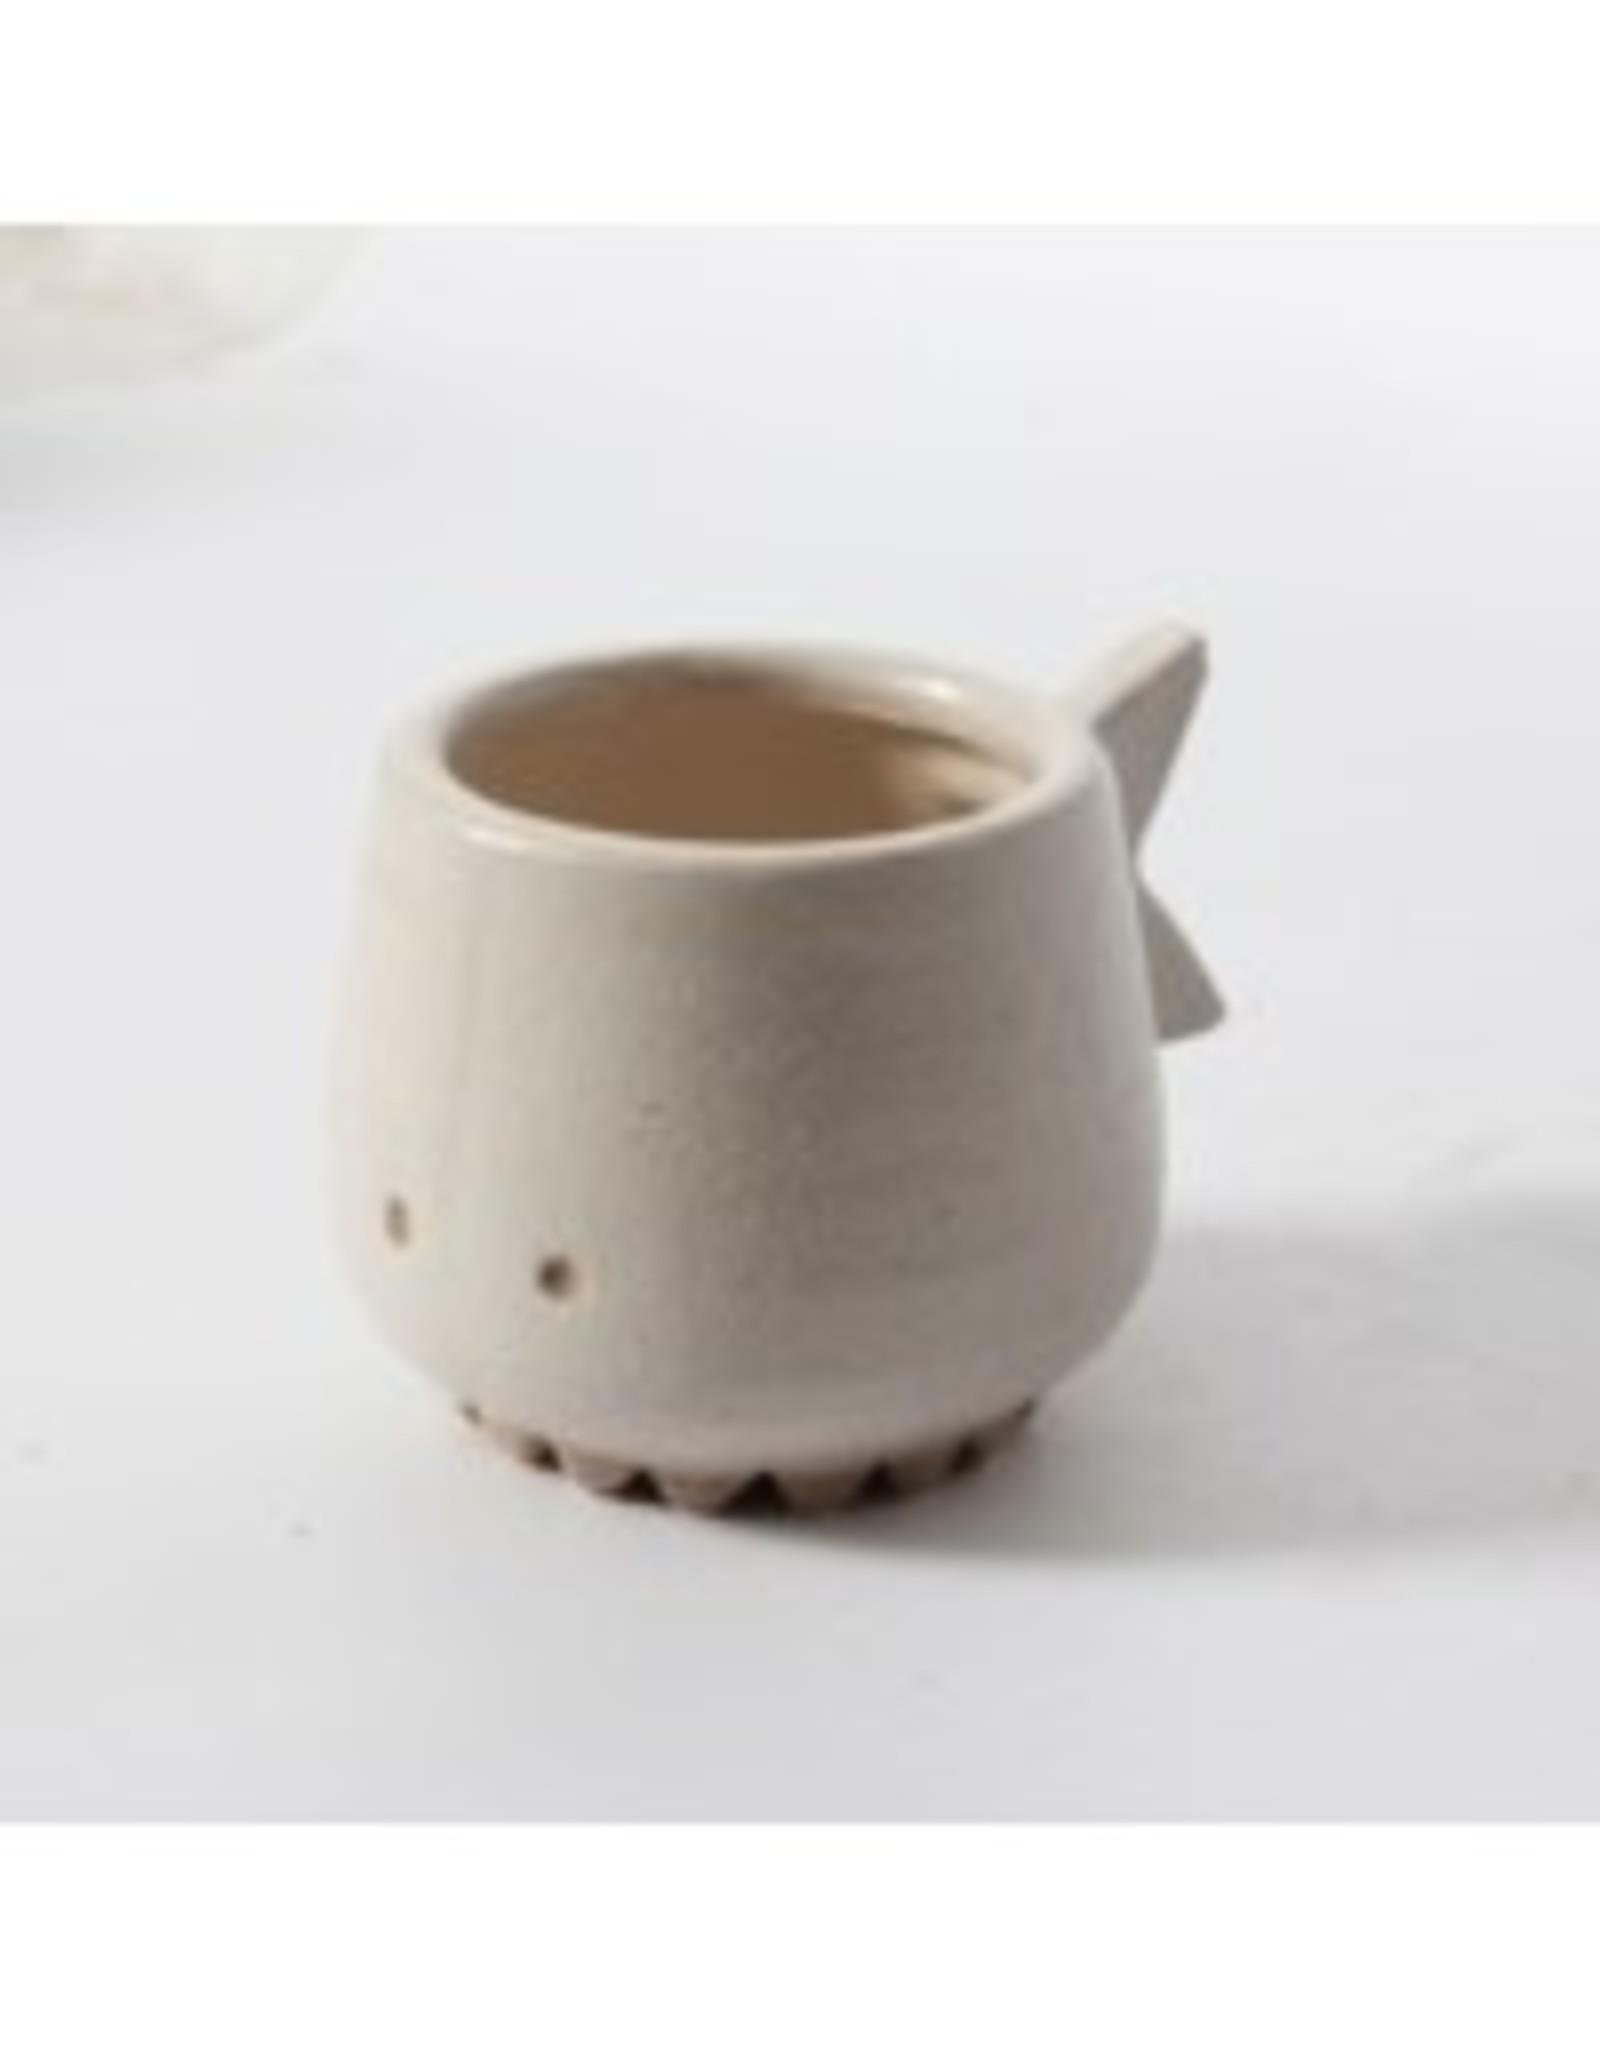 Planter CJ White Fish Ceramic Flower Pot 2091DM2654WH